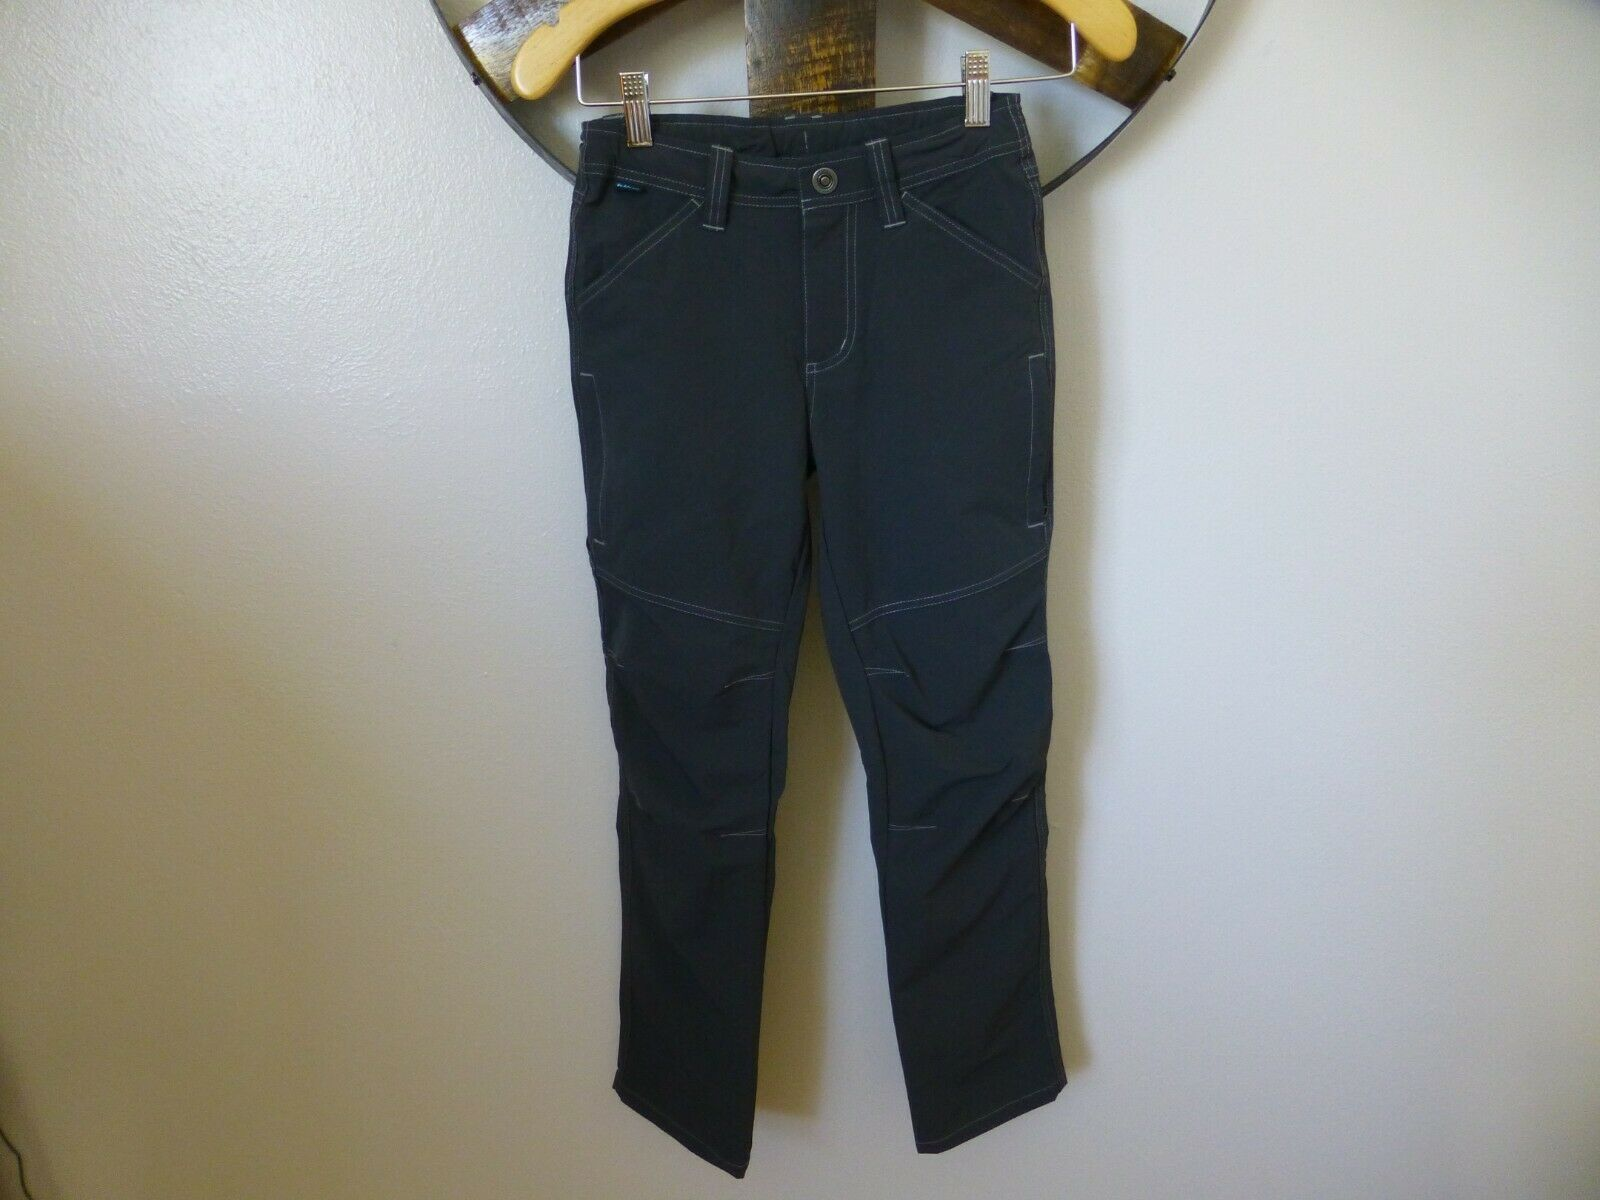 NWOT Kuhl Boys 10-12 Pants Gray Renegade Hiking Pants Stretc